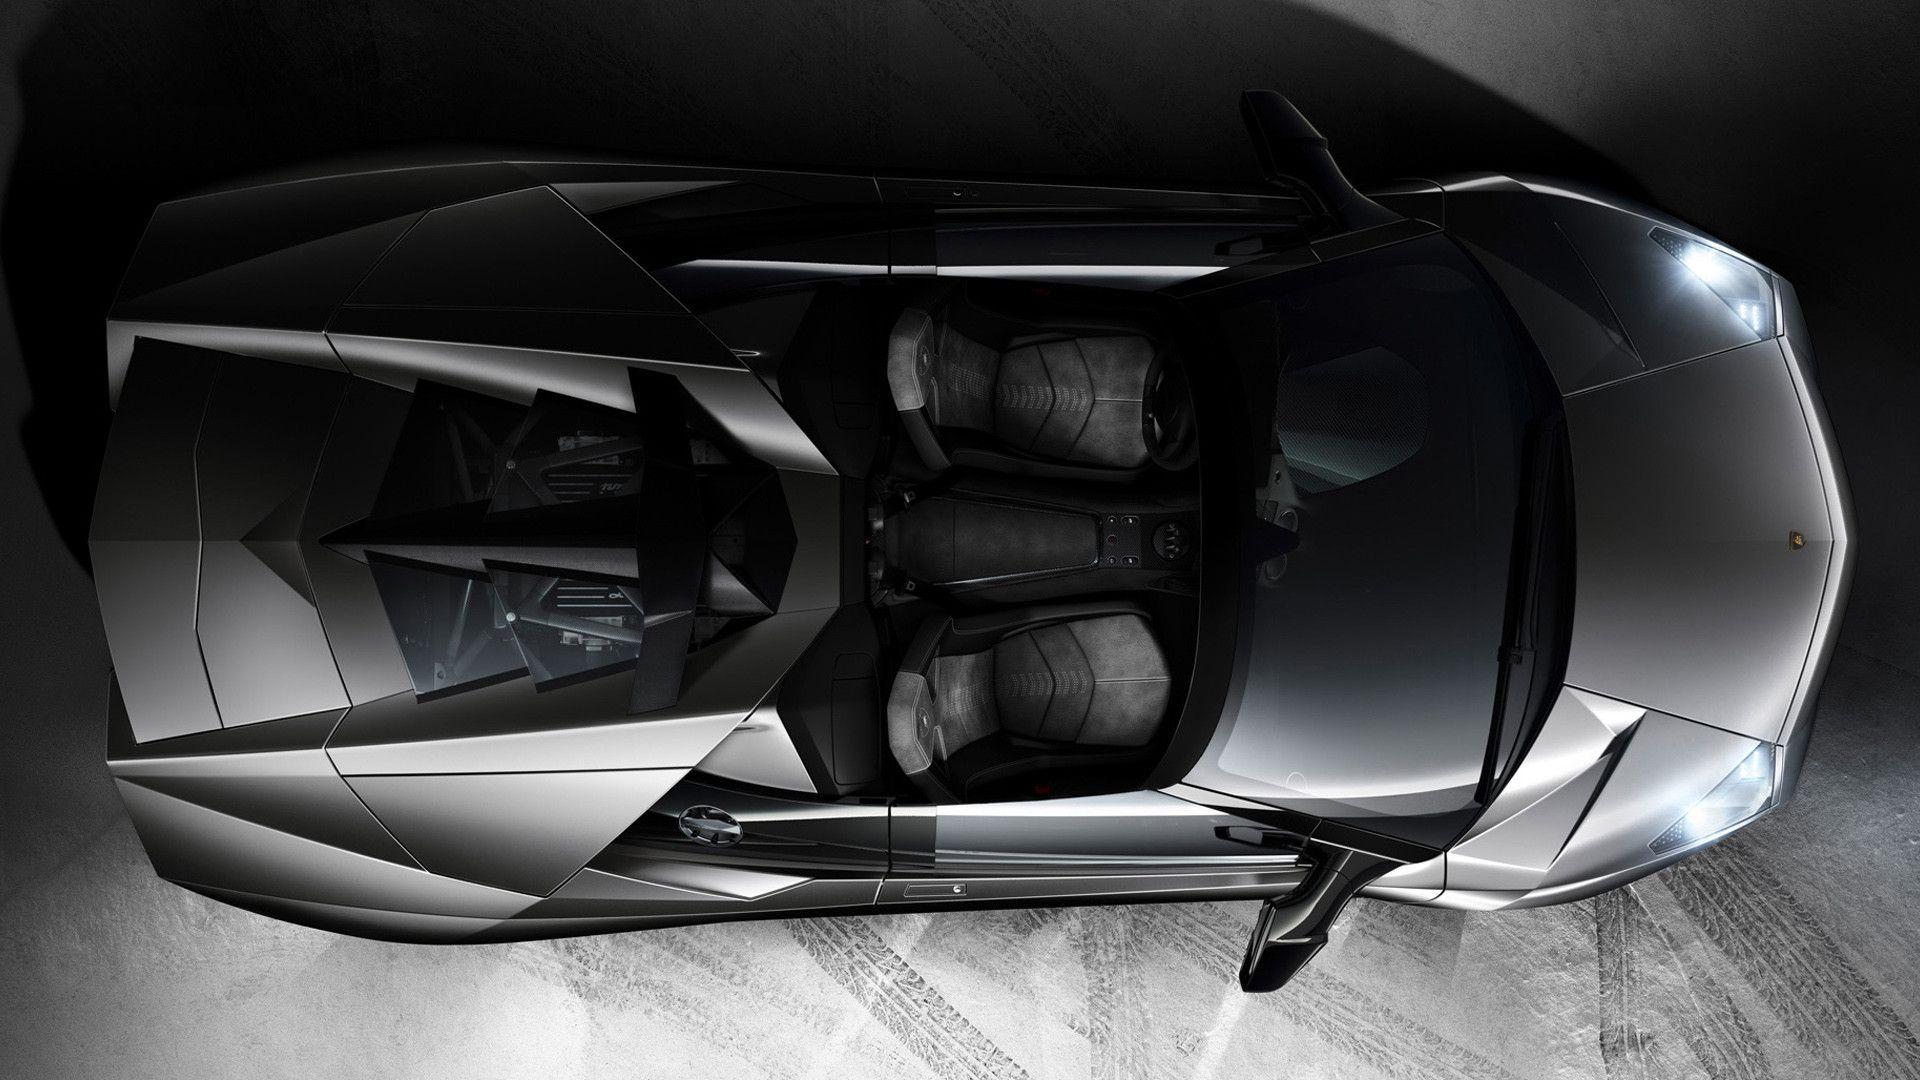 Lamborghini Reventon D Max HD Desktop Wallpaper High Definition